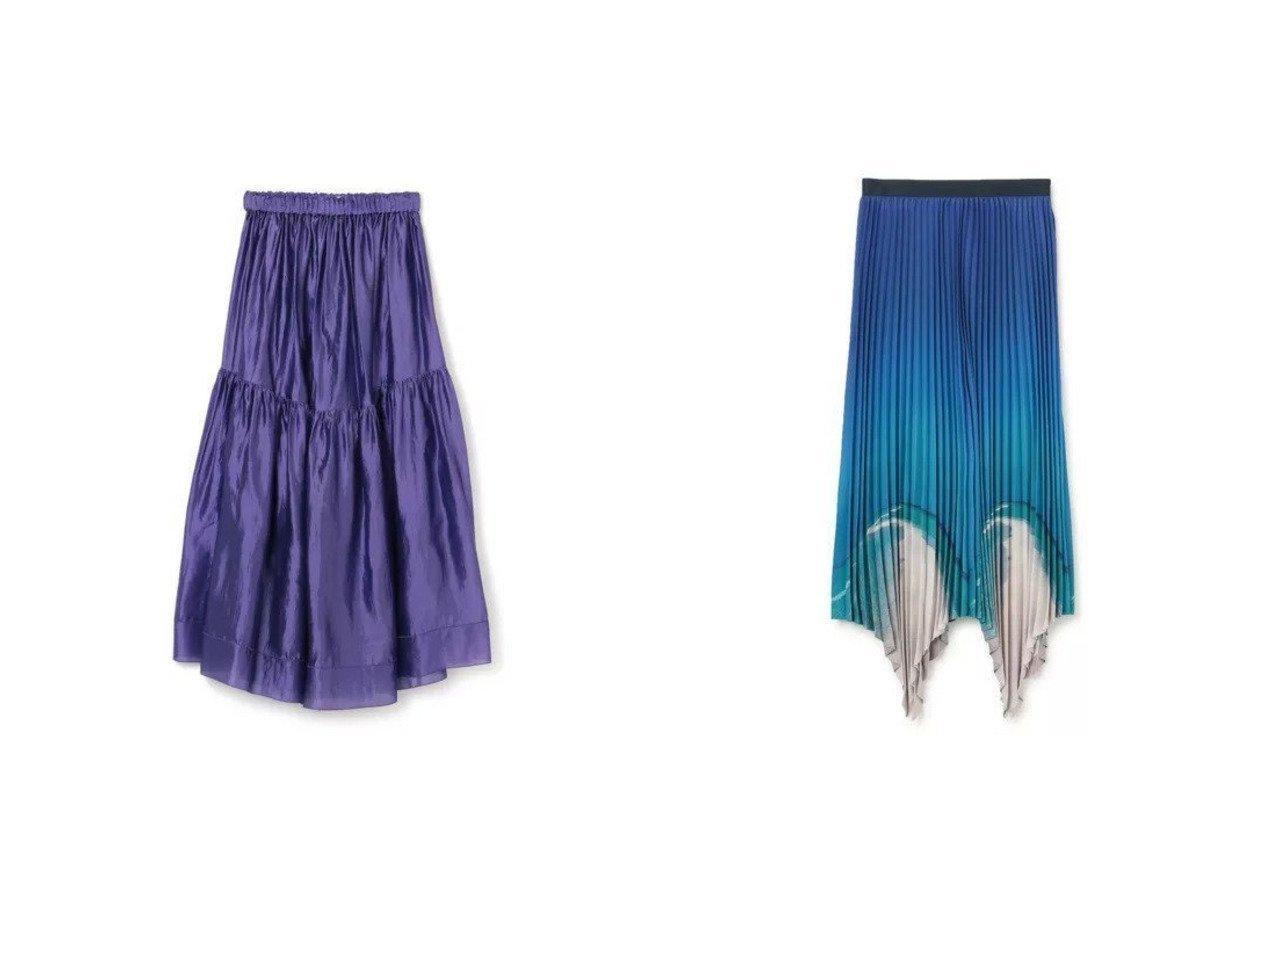 【BLAMINK/ブラミンク】のシルクギャザーロングスカート&【G.V.G.V./ジーヴィージーヴィ】のBEACH PRINT PLEATED SKIRT 【スカート】おすすめ!人気、トレンド・レディースファッションの通販 おすすめで人気の流行・トレンド、ファッションの通販商品 インテリア・家具・メンズファッション・キッズファッション・レディースファッション・服の通販 founy(ファニー) https://founy.com/ ファッション Fashion レディースファッション WOMEN スカート Skirt プリーツスカート Pleated Skirts ロングスカート Long Skirt 2021年 2021 2021春夏・S/S SS/Spring/Summer/2021 S/S・春夏 SS・Spring/Summer イレヘム プリント プリーツ マキシ ロング 今季 ギャザー シルク ランダム |ID:crp329100000045130